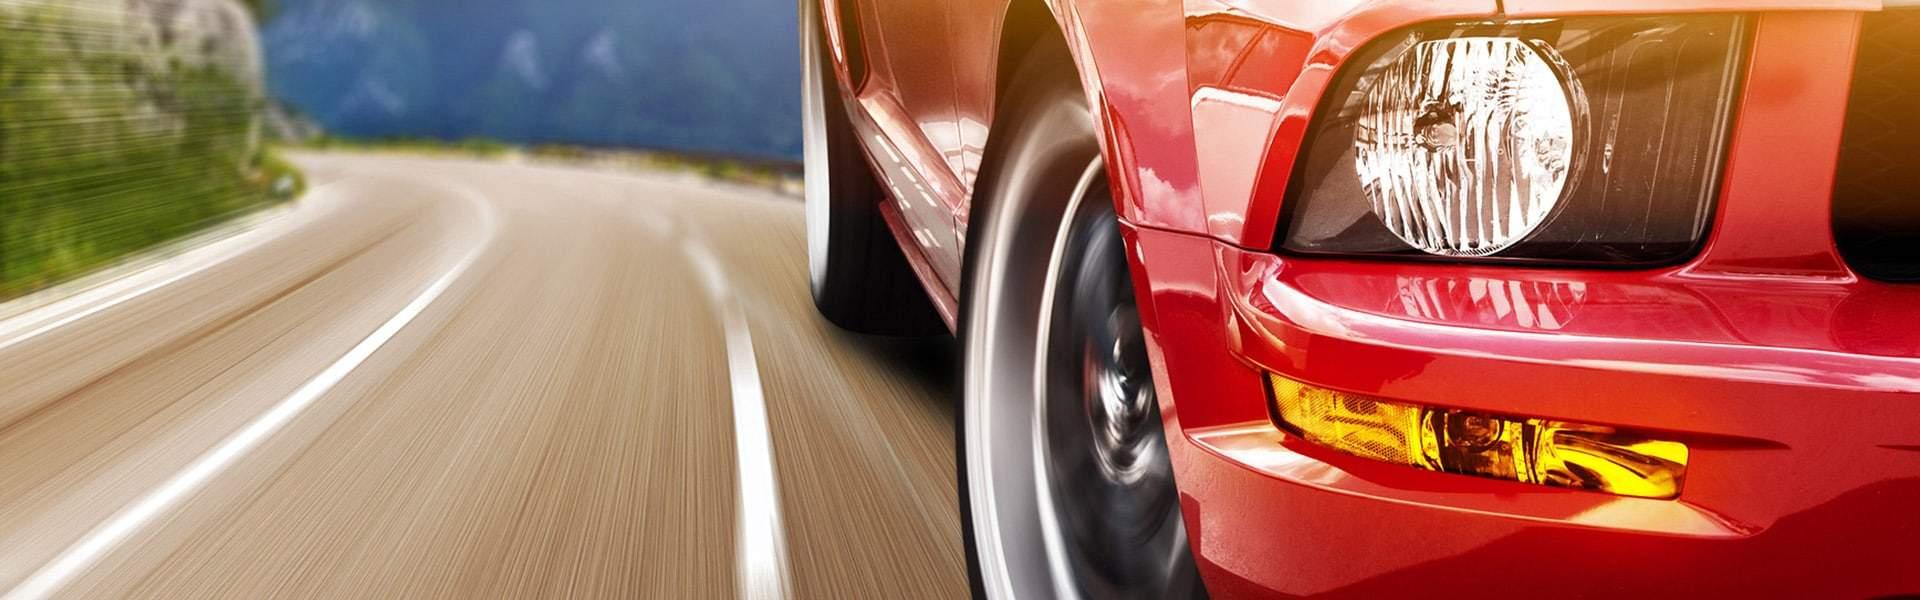 Sports Car Tires